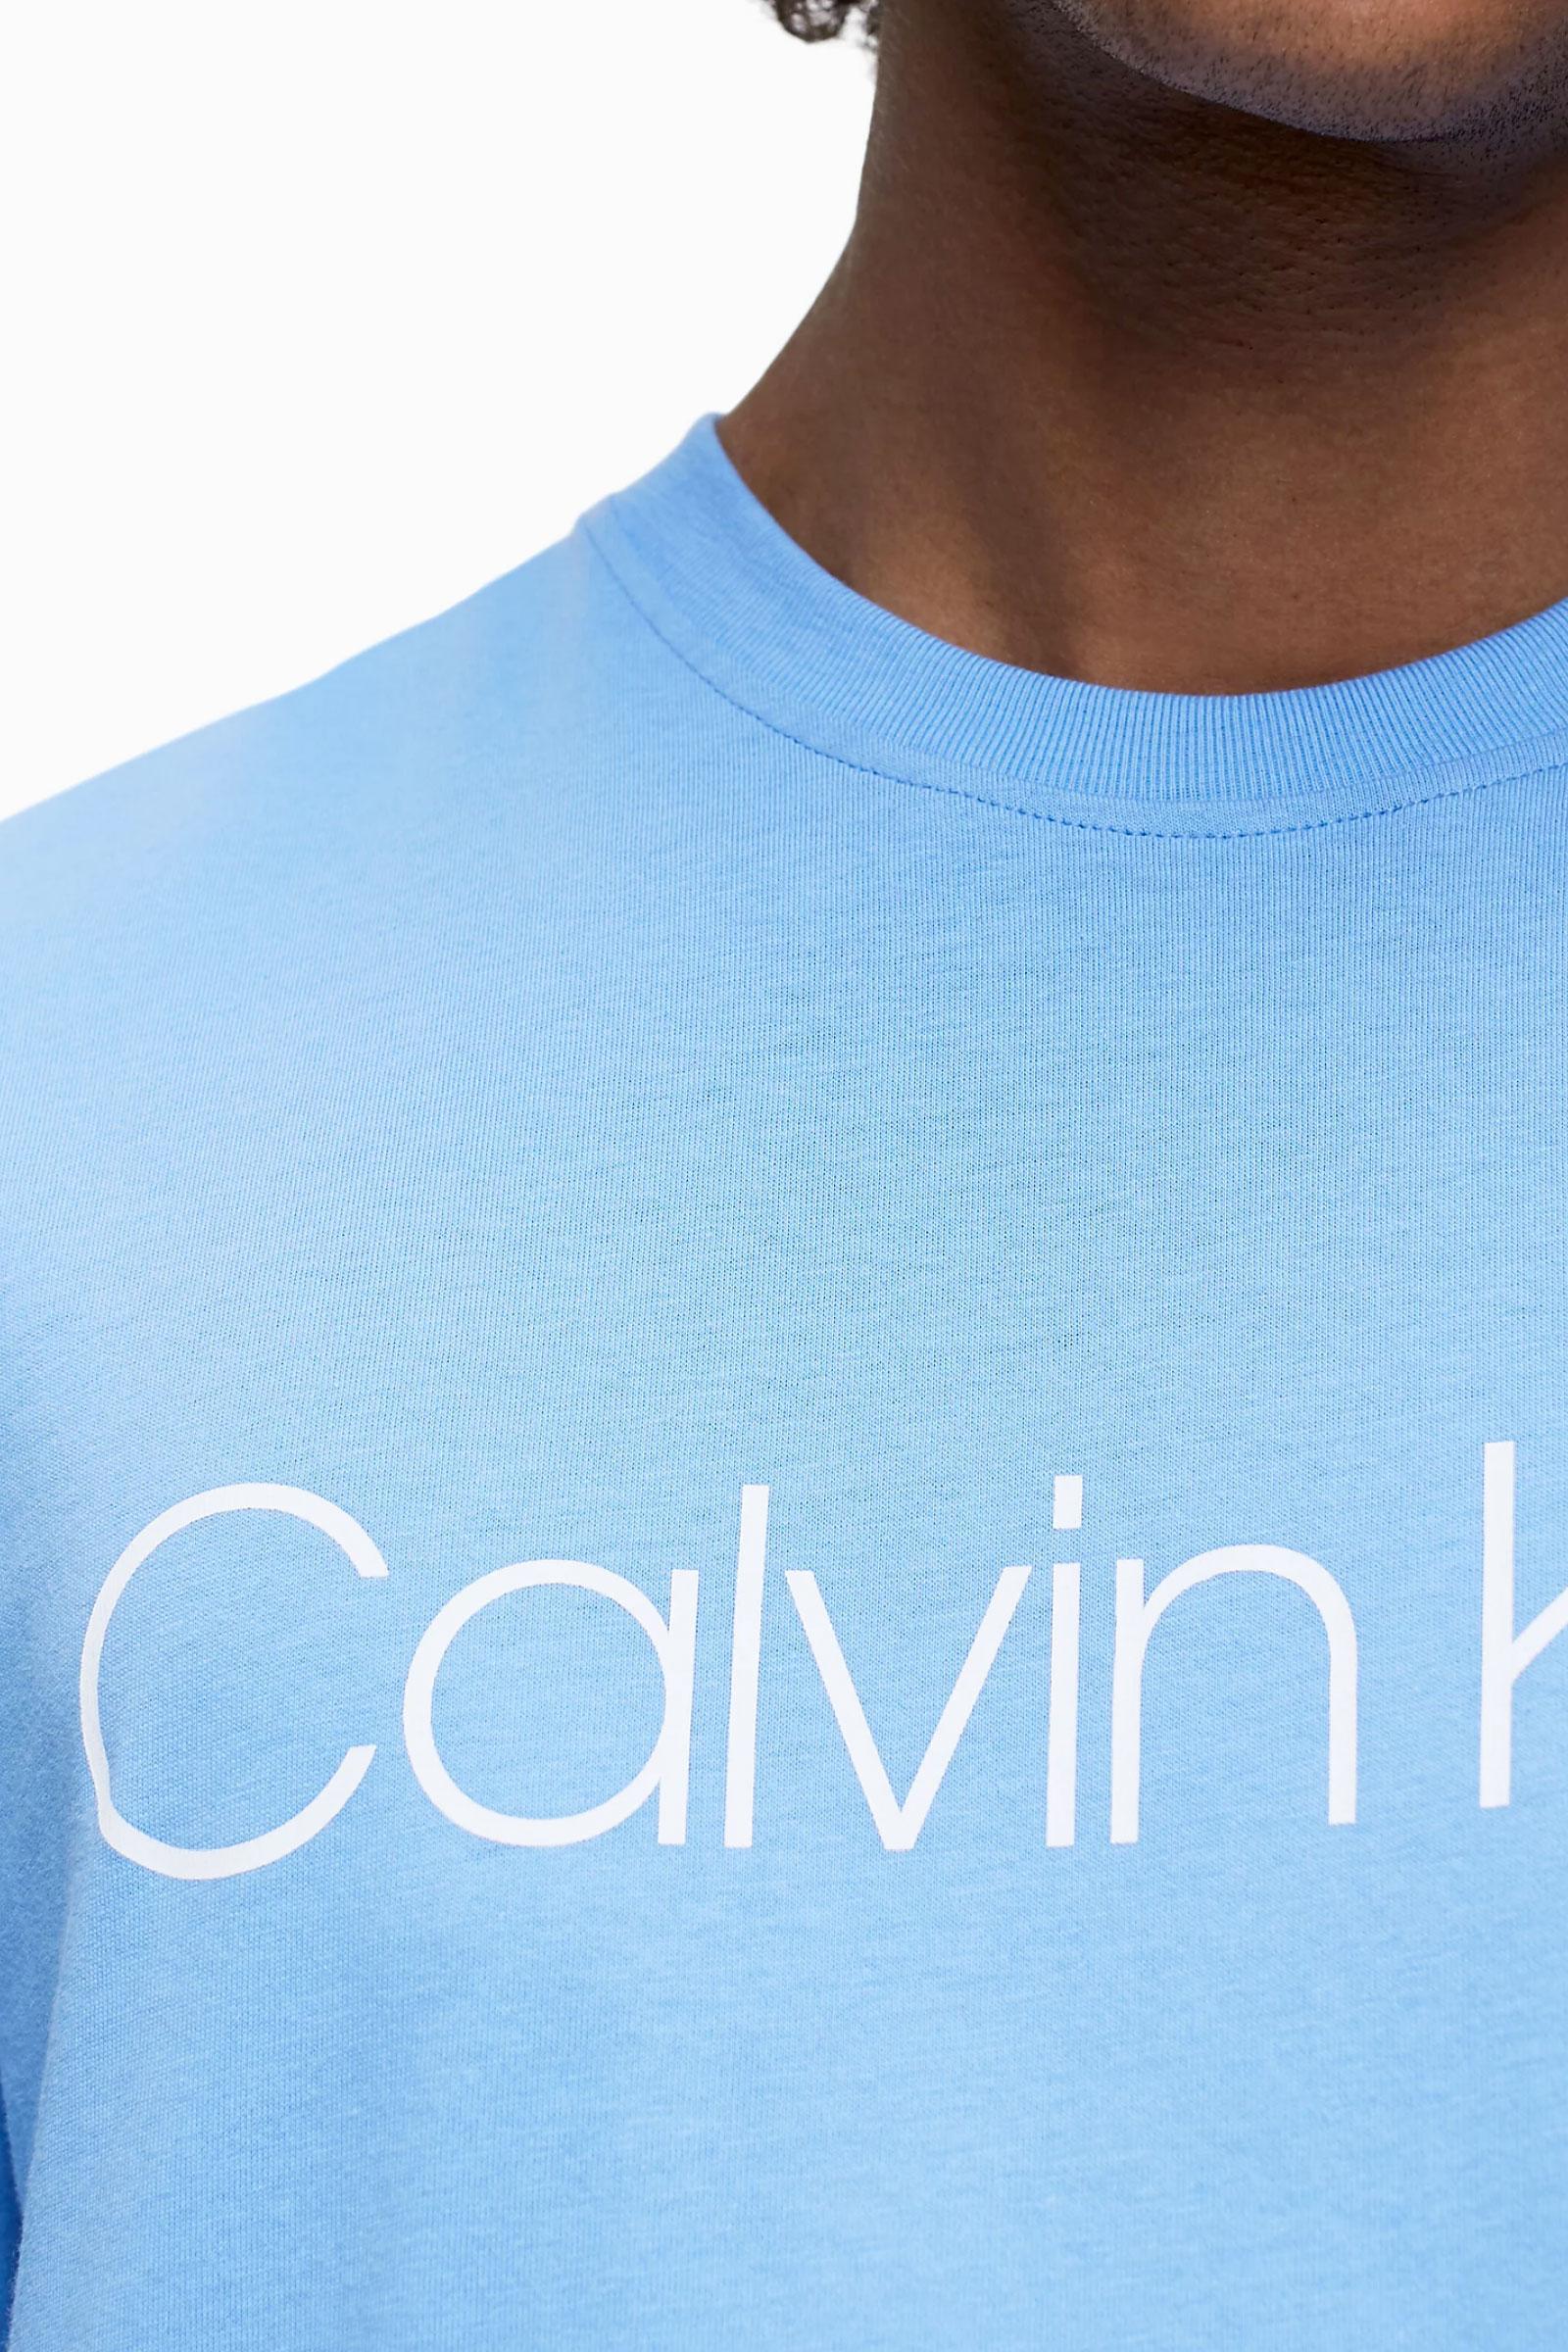 CALVIN KLEIN Men's T-Shirt CALVIN KLEIN   T-Shirt   K10K103078CJ1